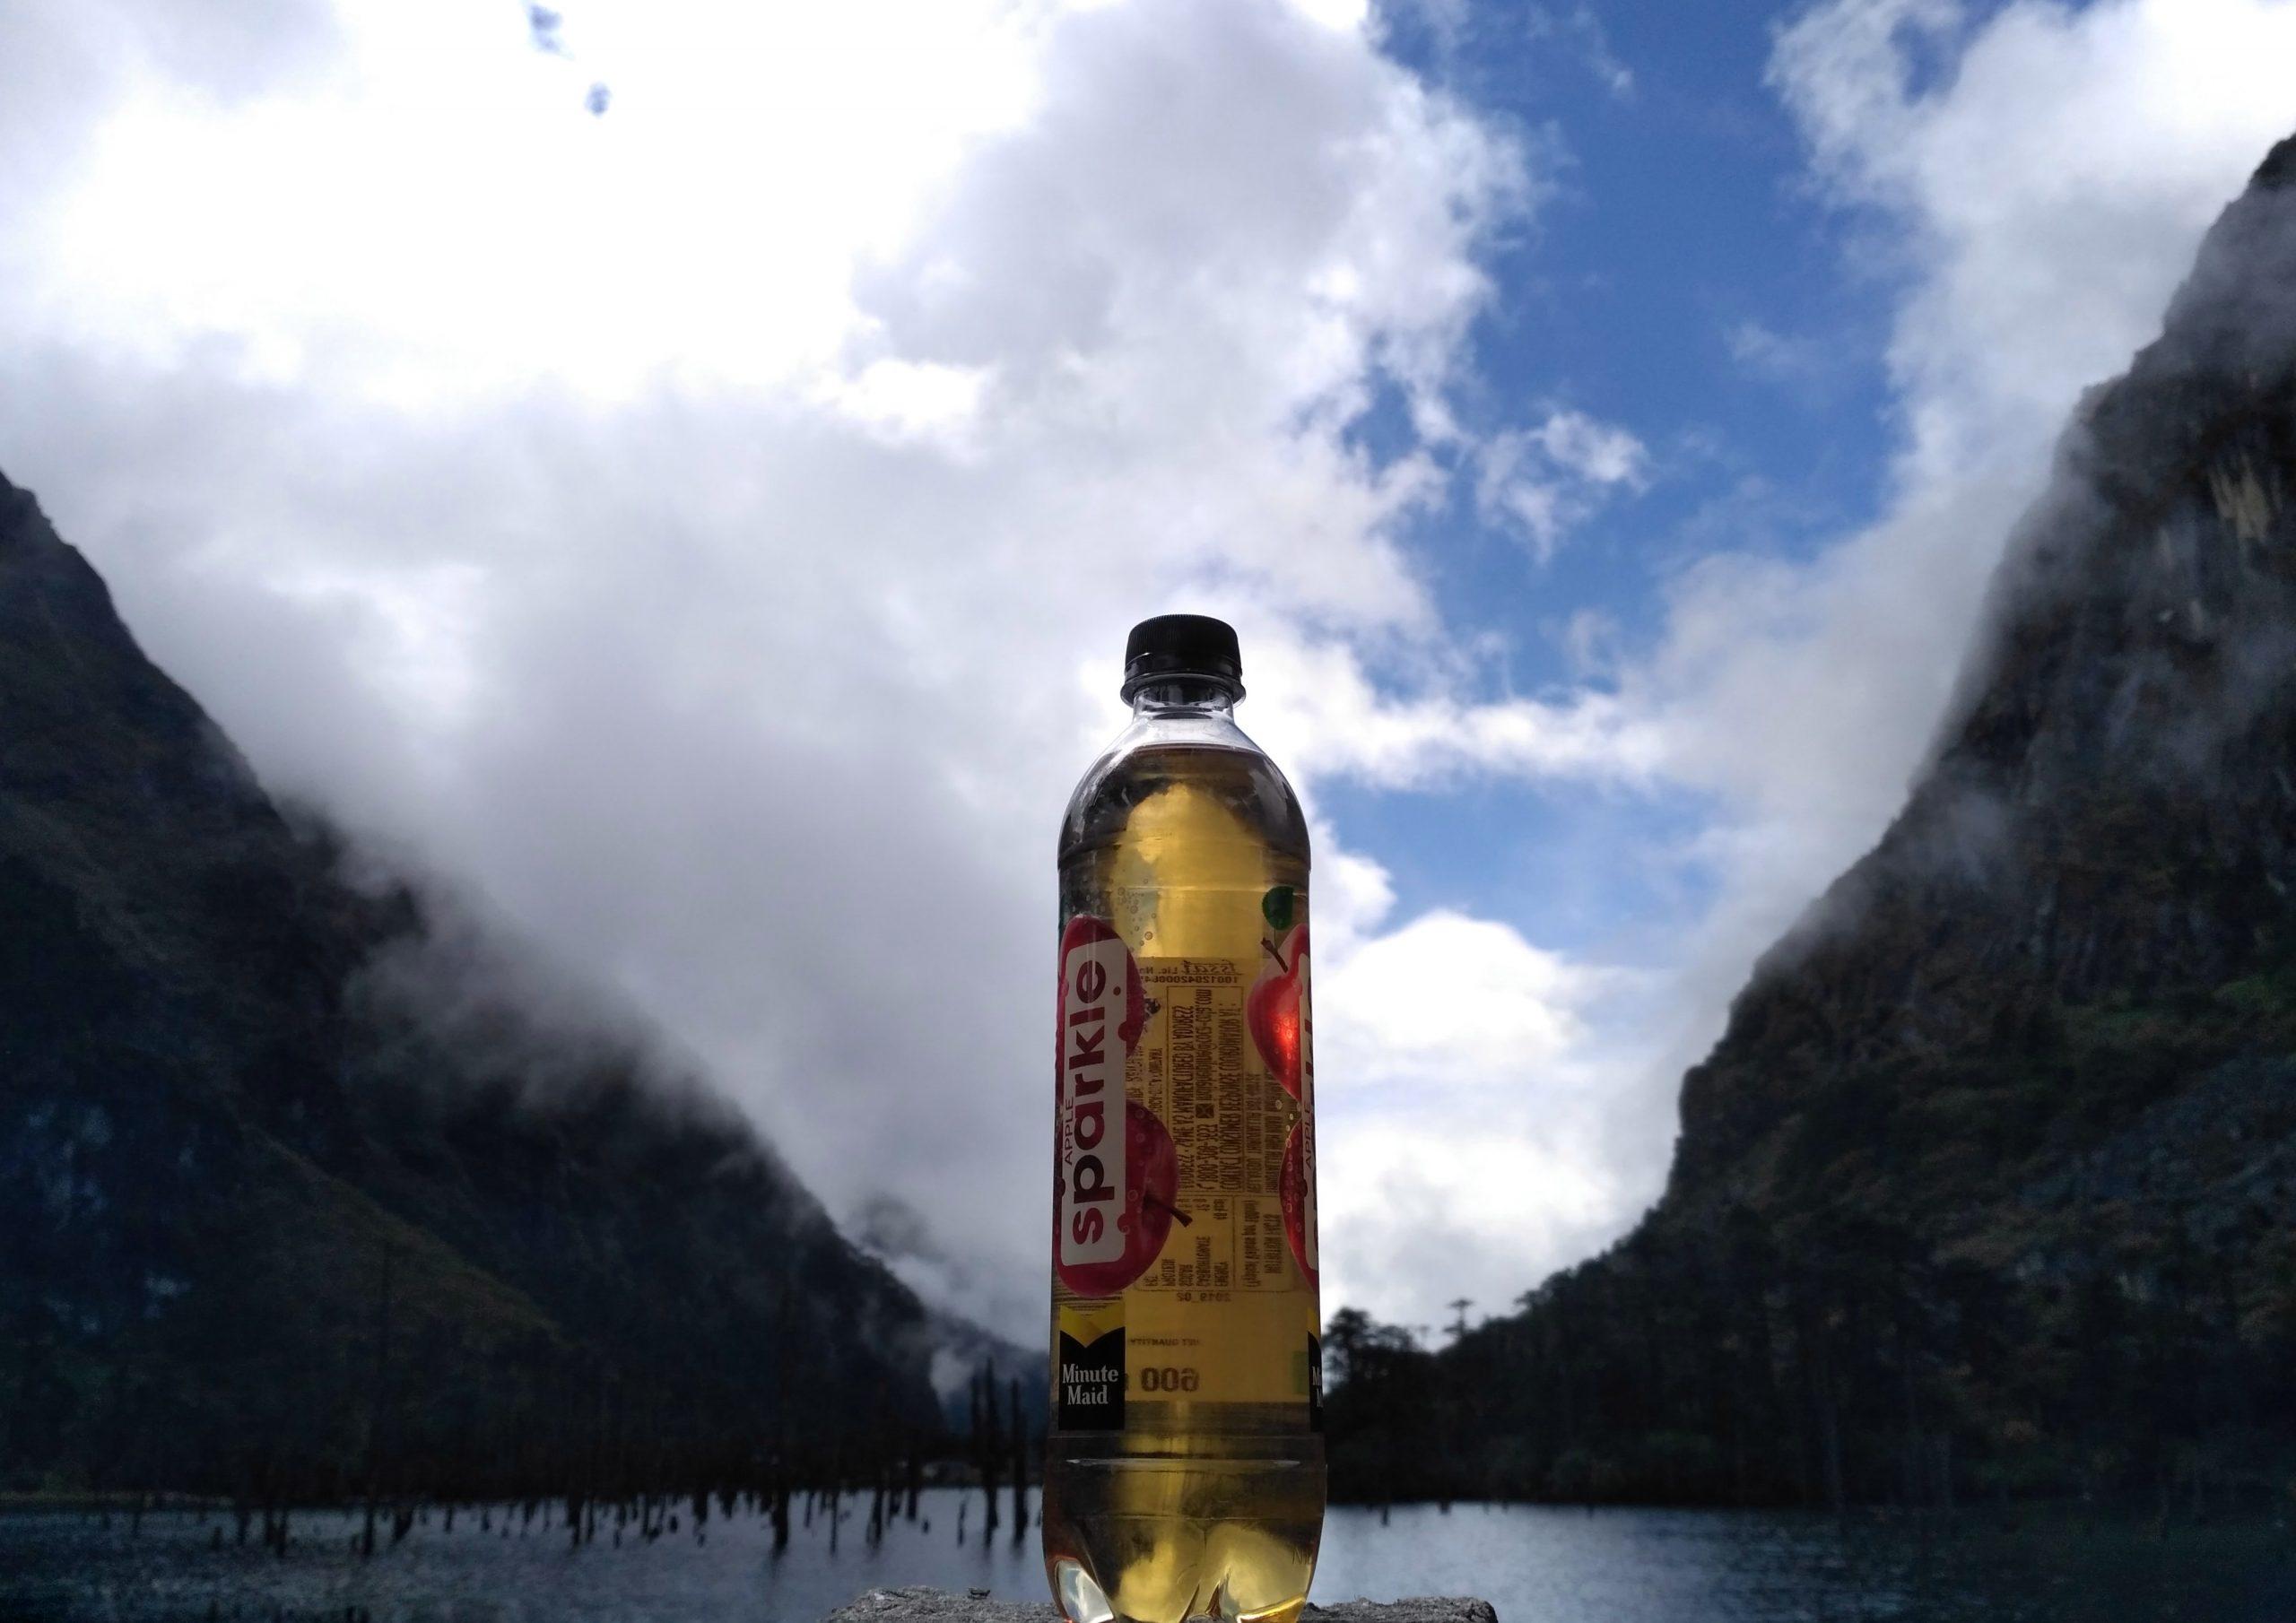 A soft drink bottle